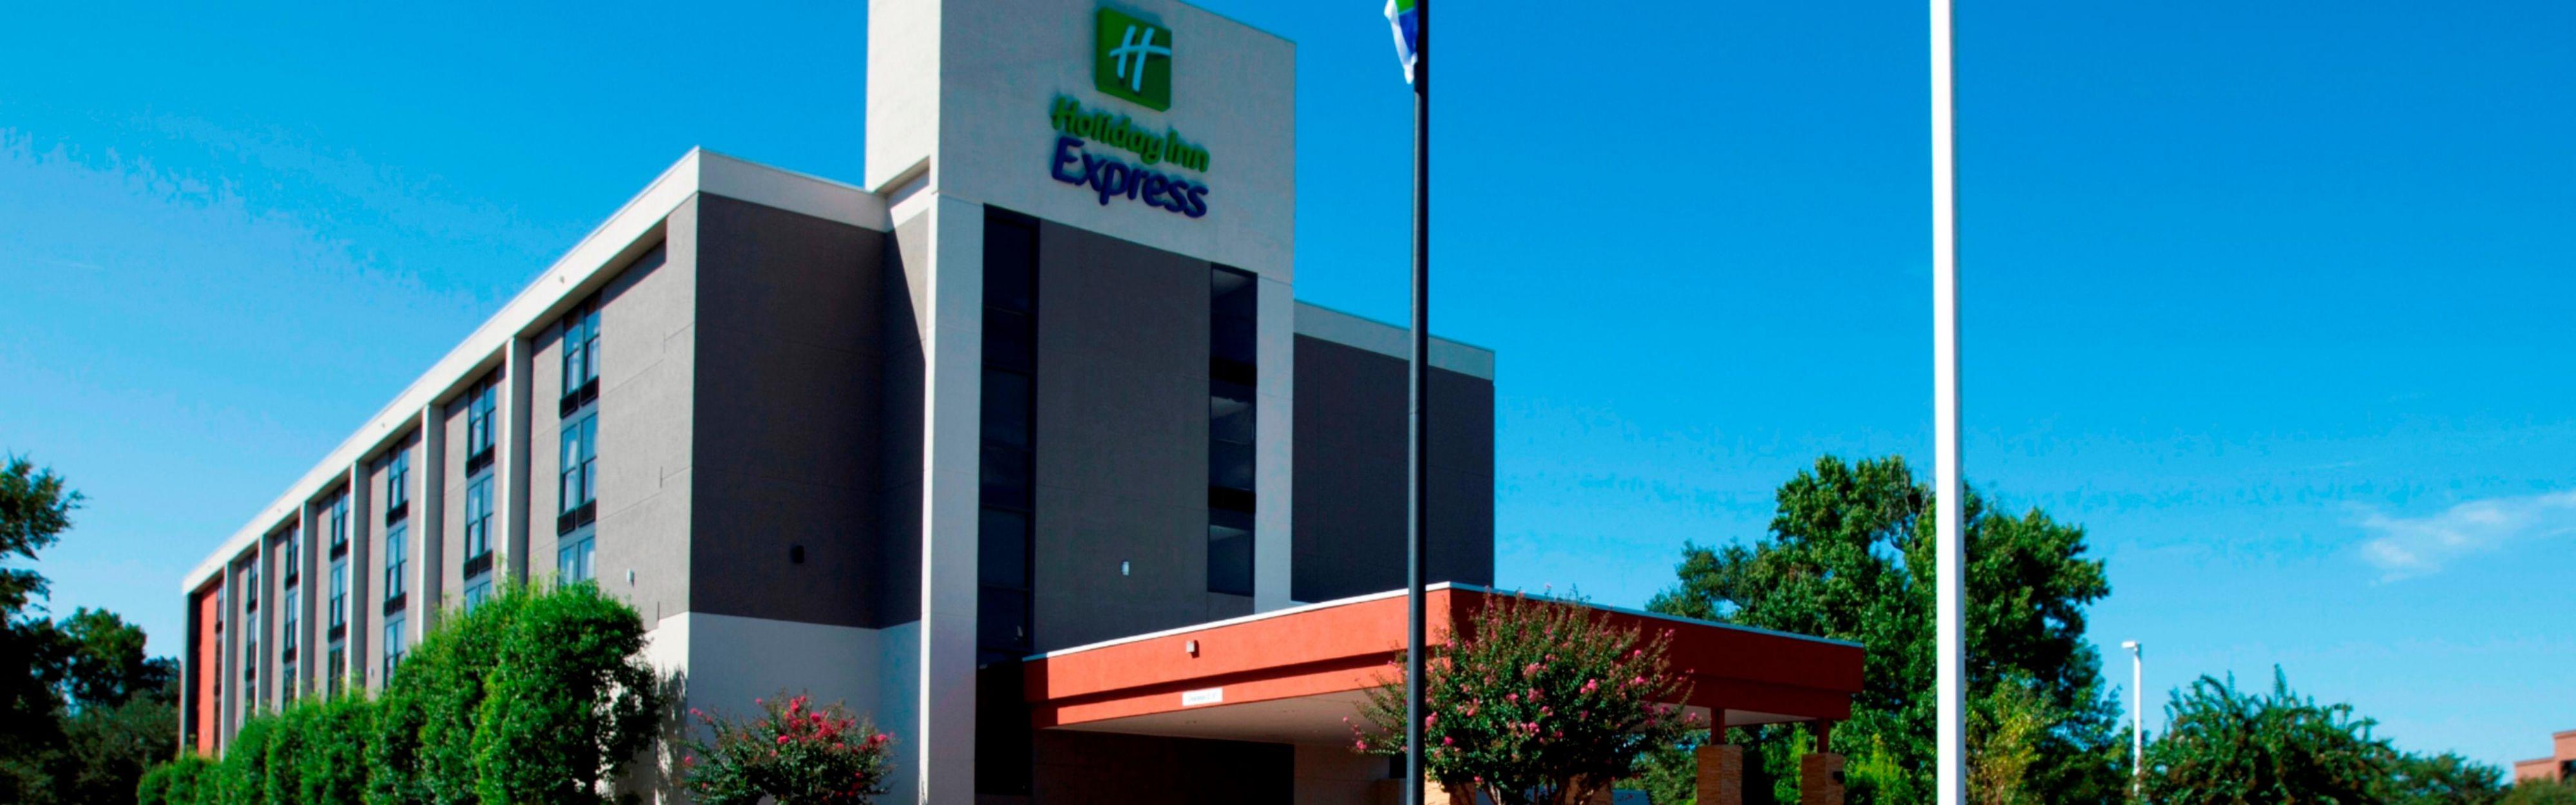 Holiday Inn Express Tallahassee - I-10 E image 0